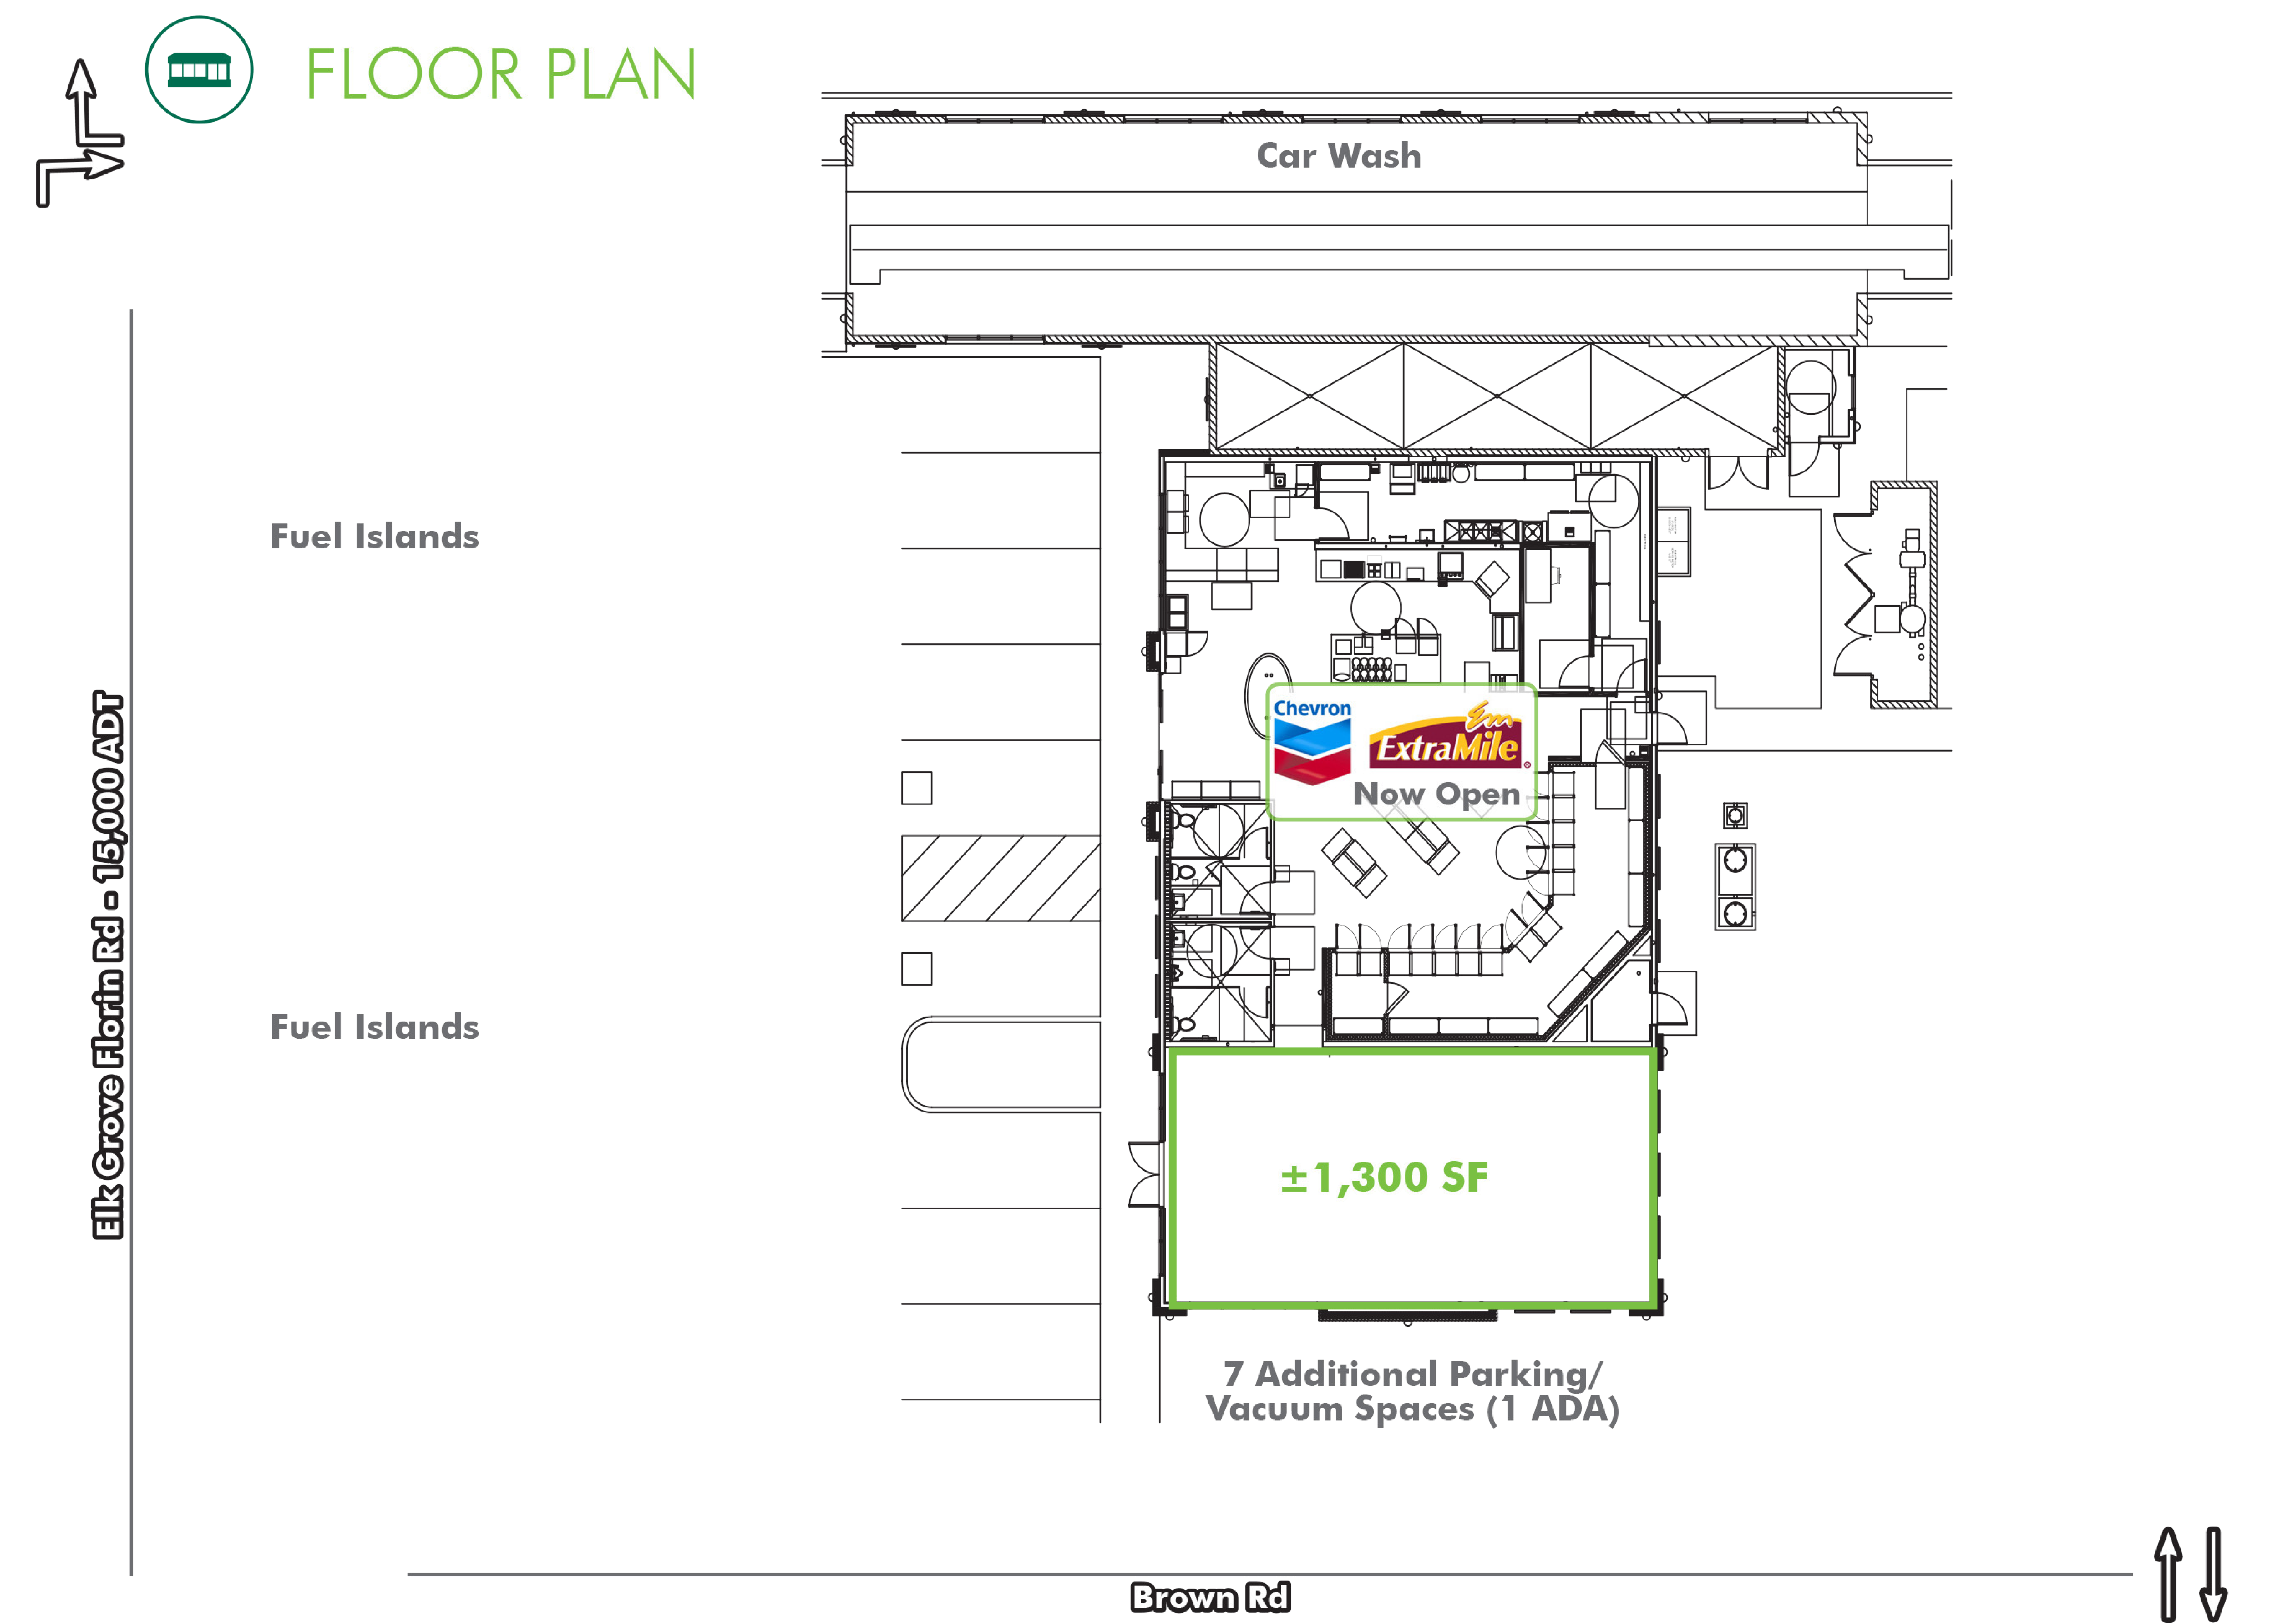 Restaurant/Shop Space - Elk Grove Florin: site plan